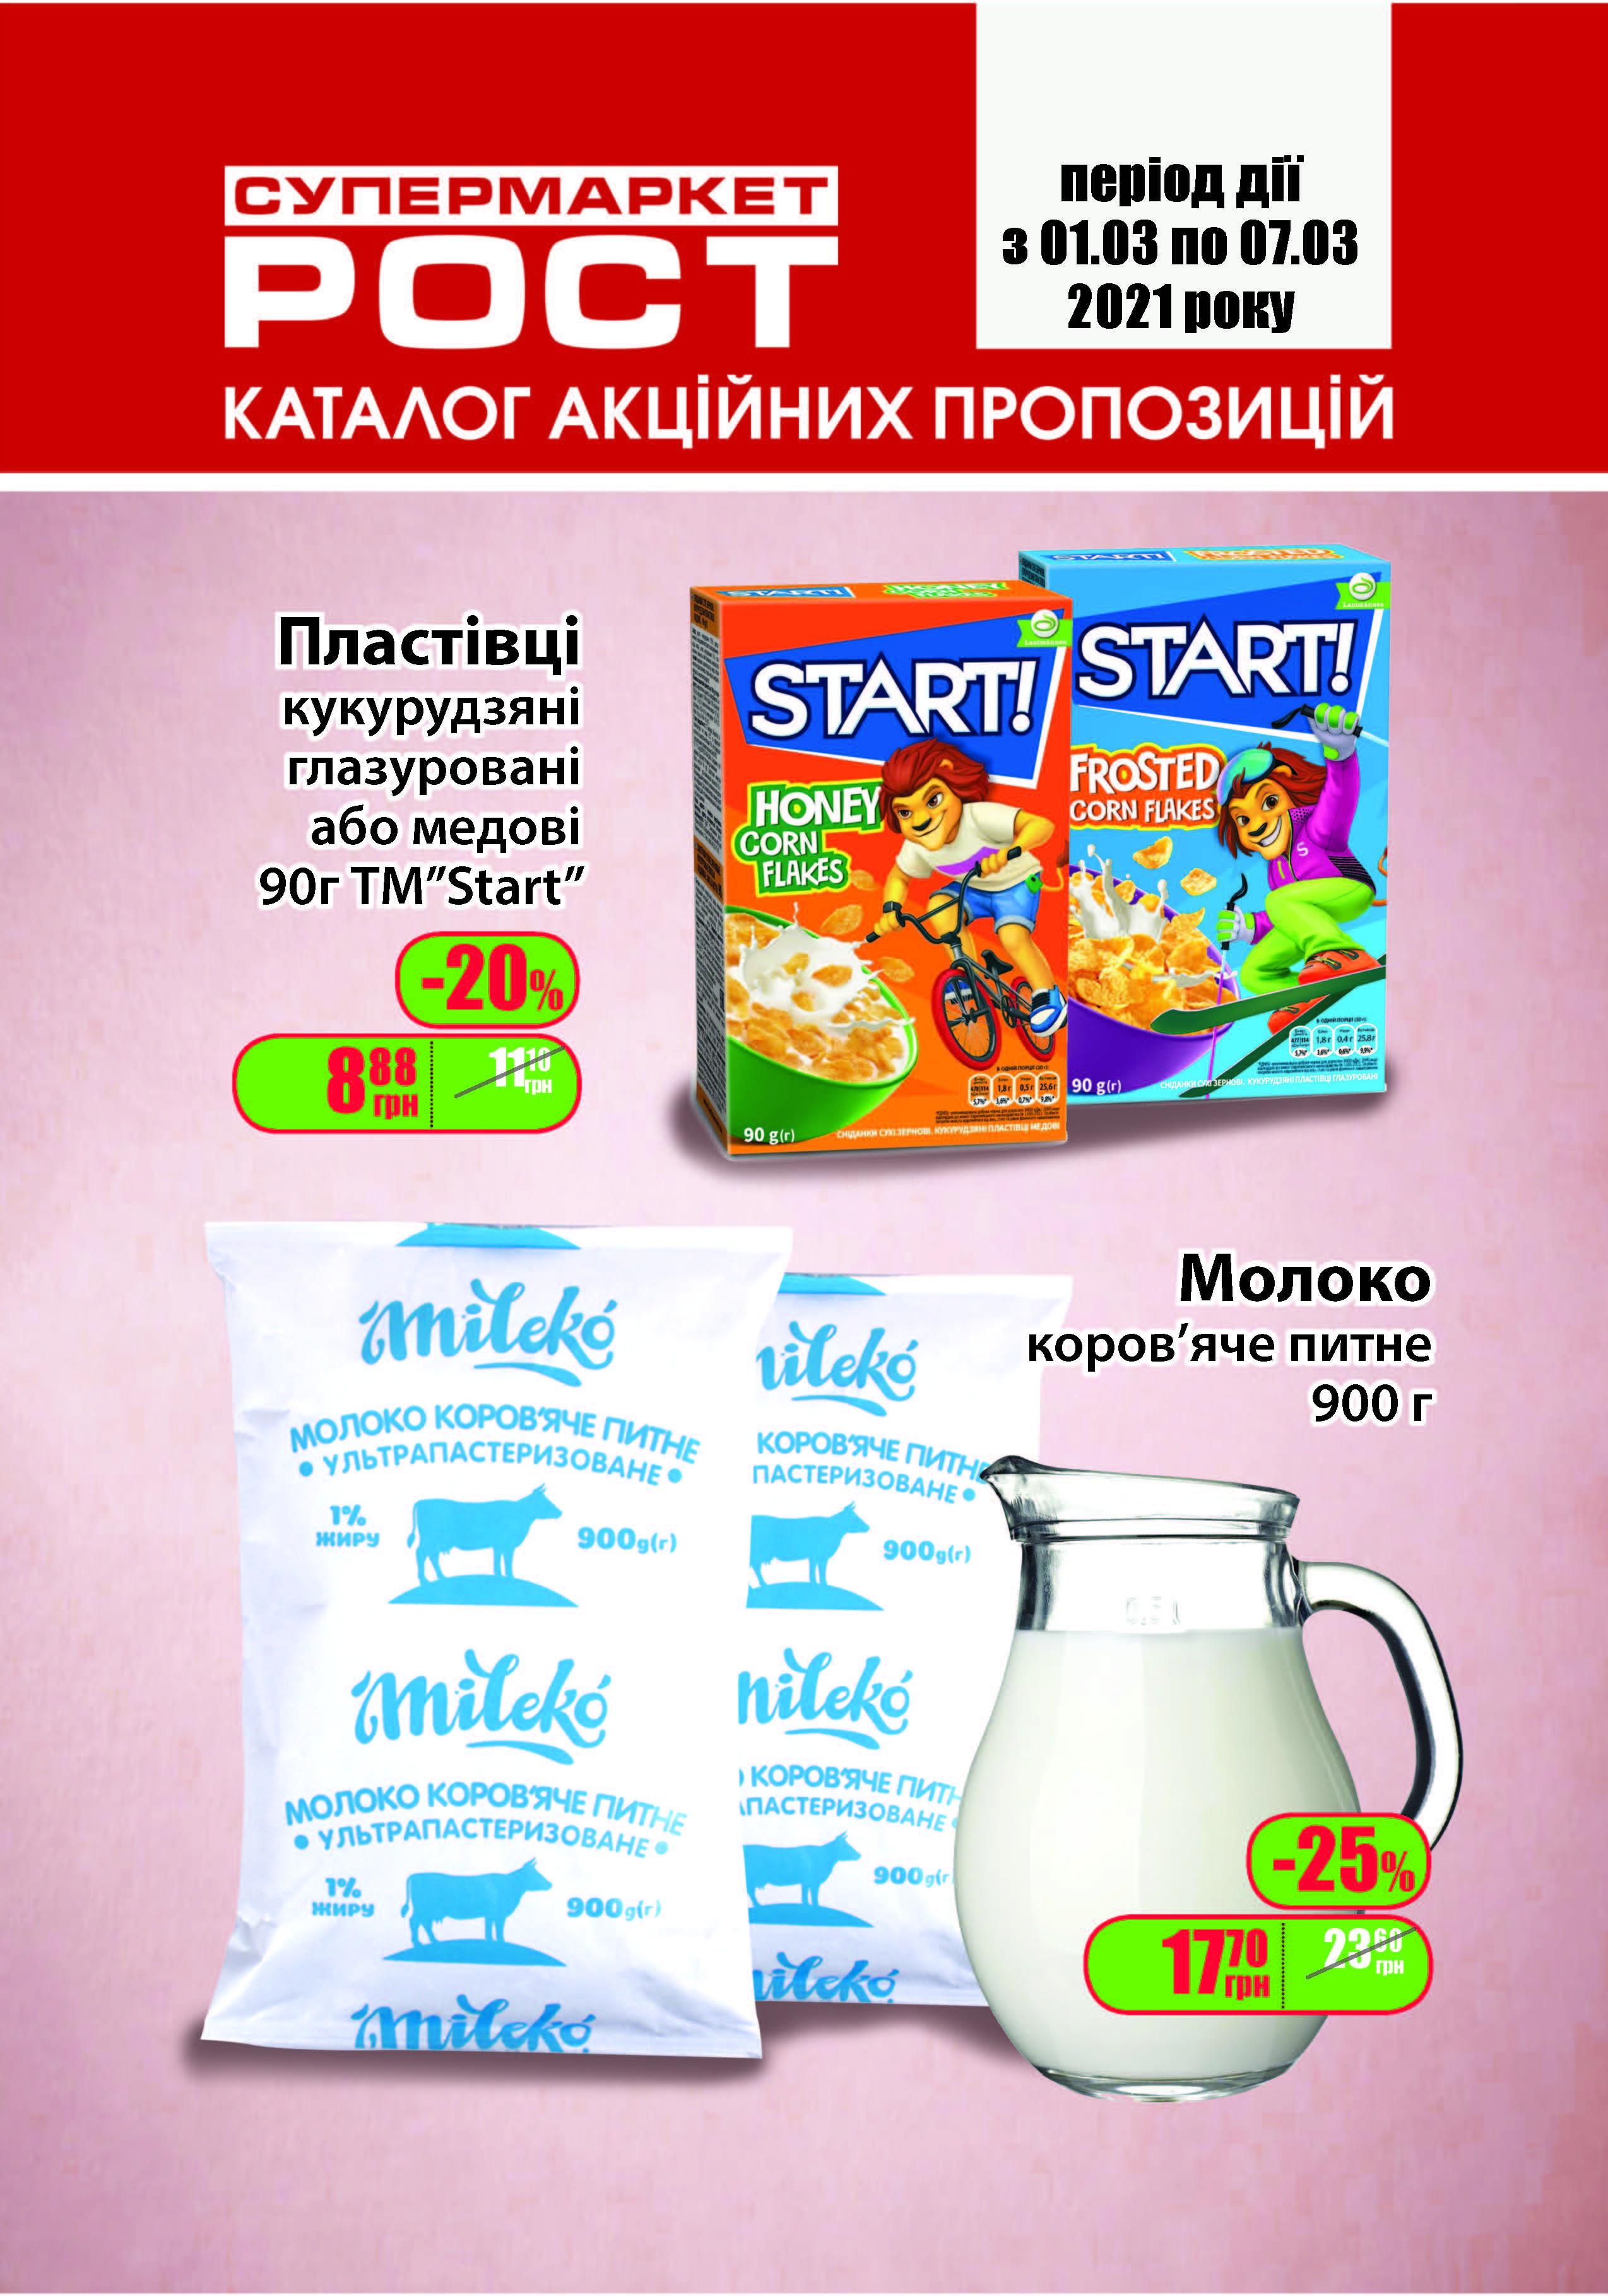 nedelnaya-6-print_page_1